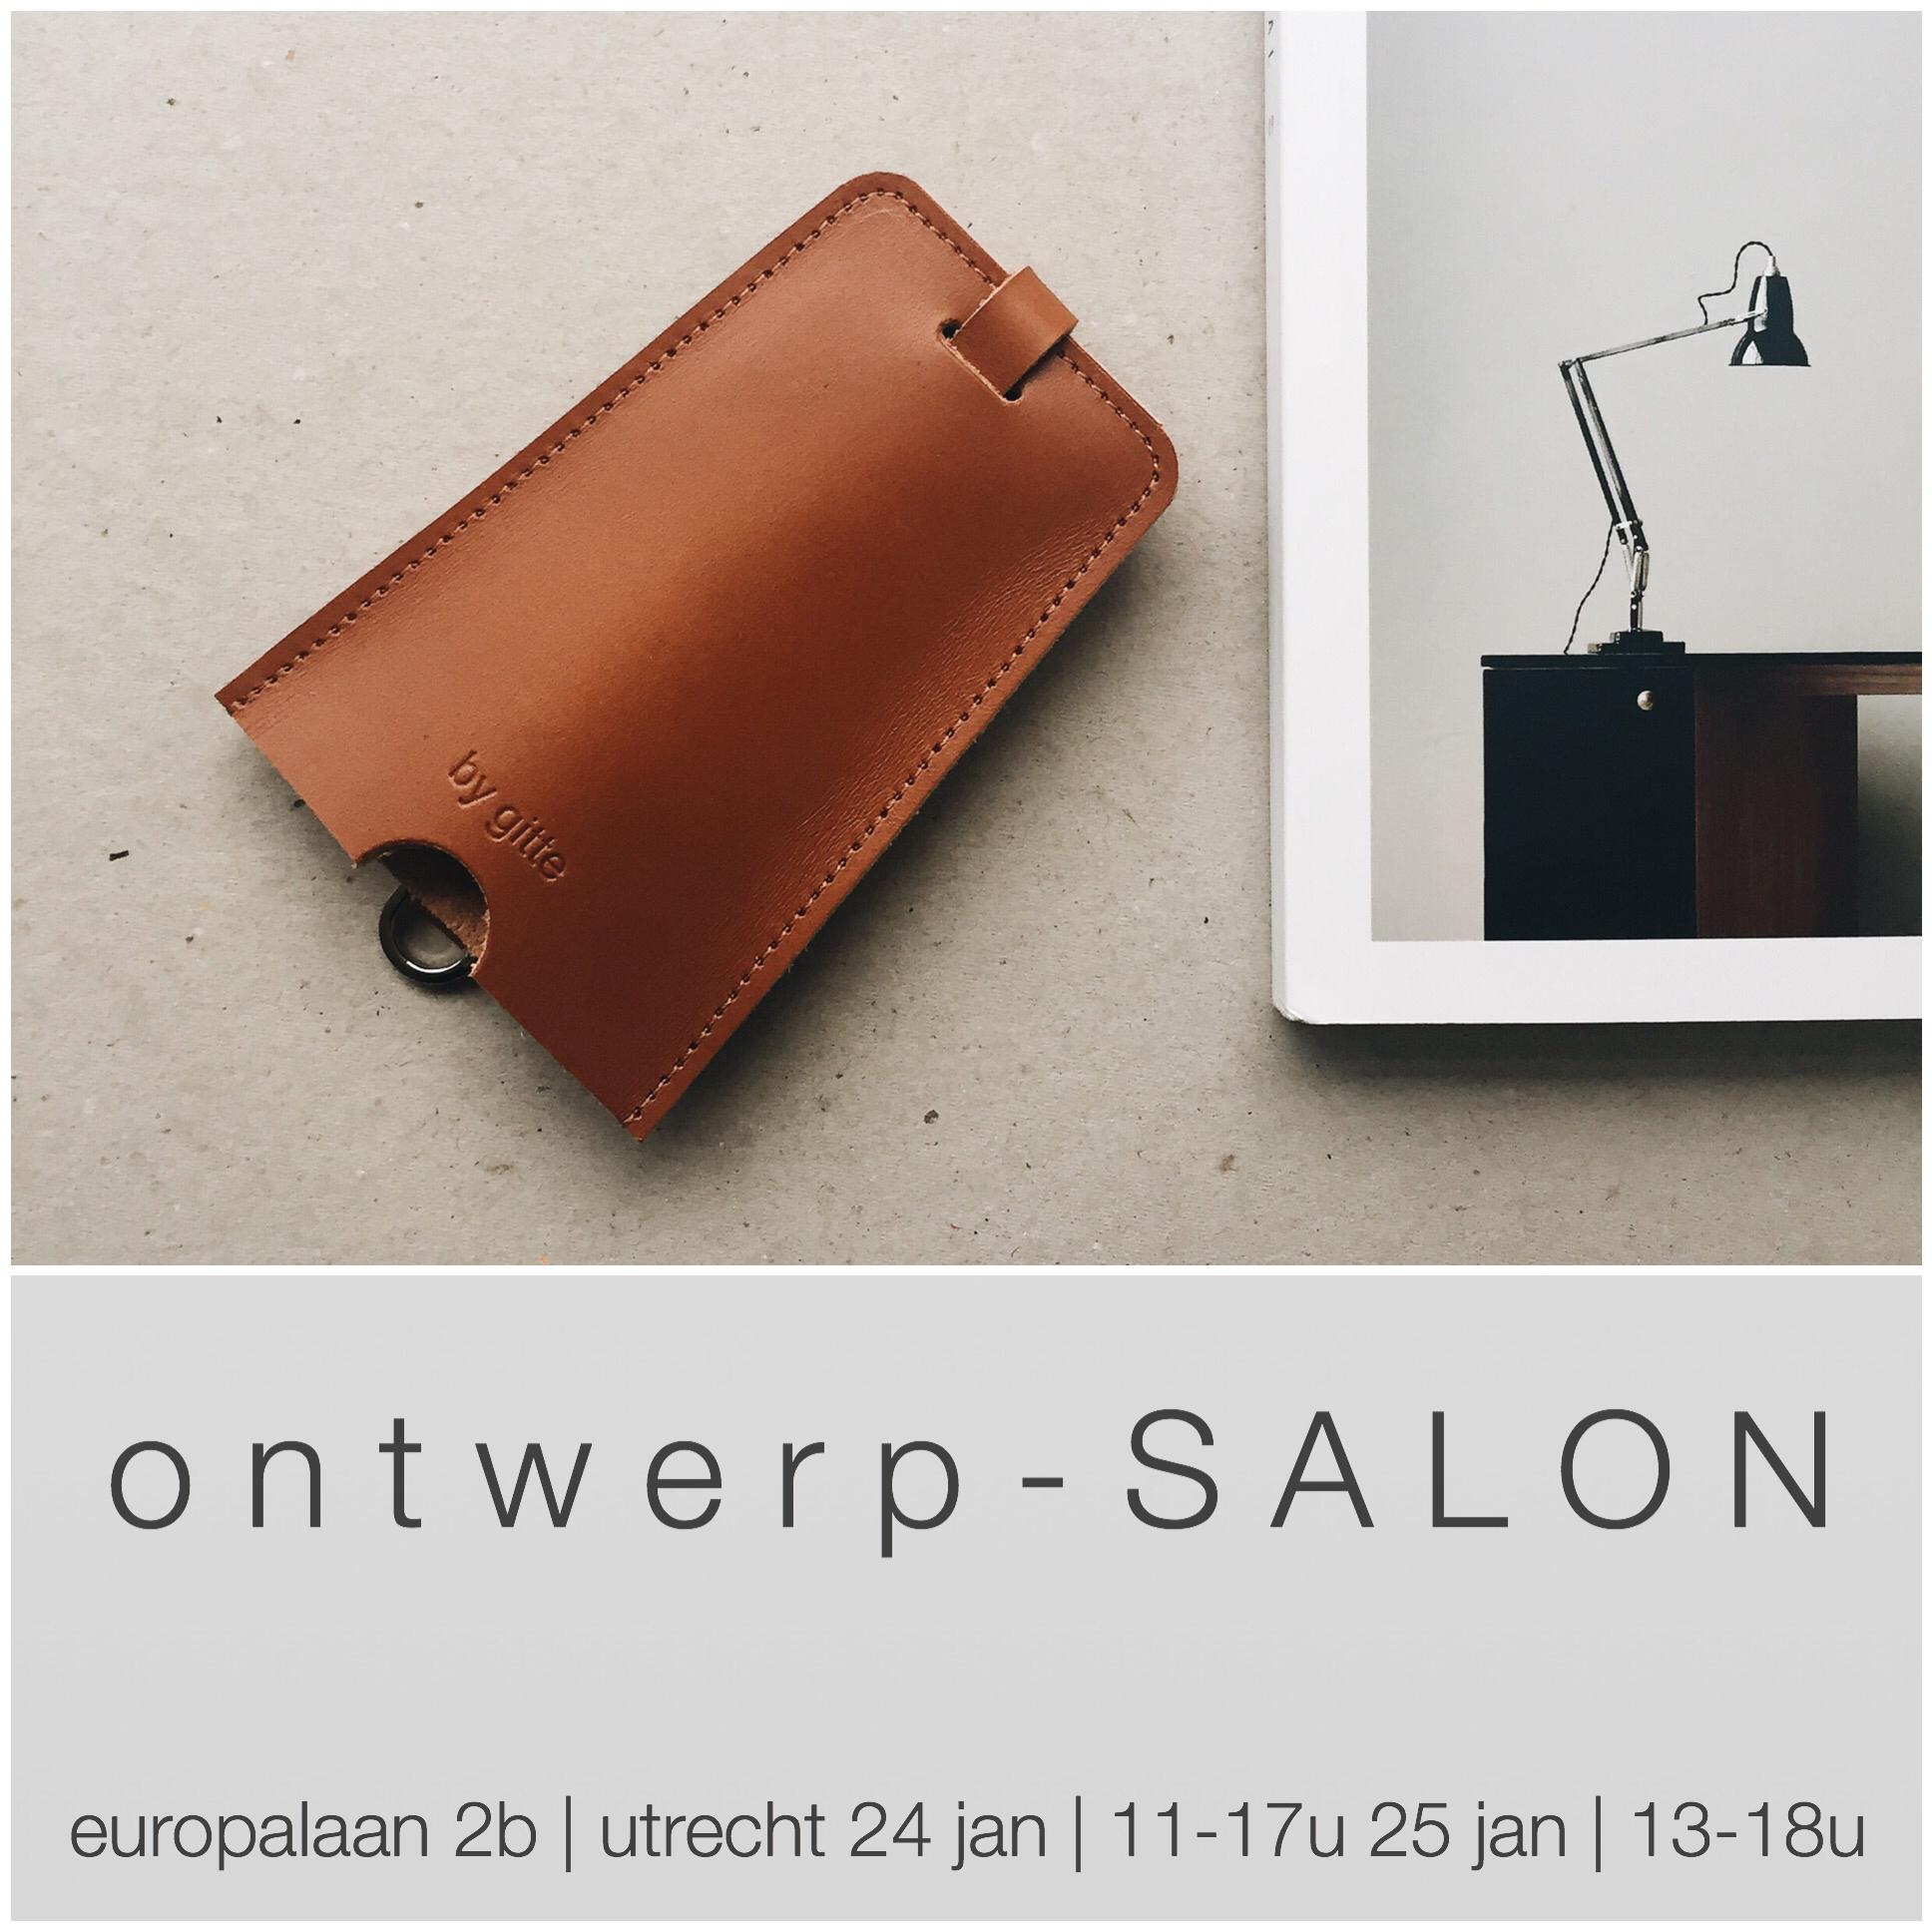 Ontwerp salon - Spa ontwerp ...